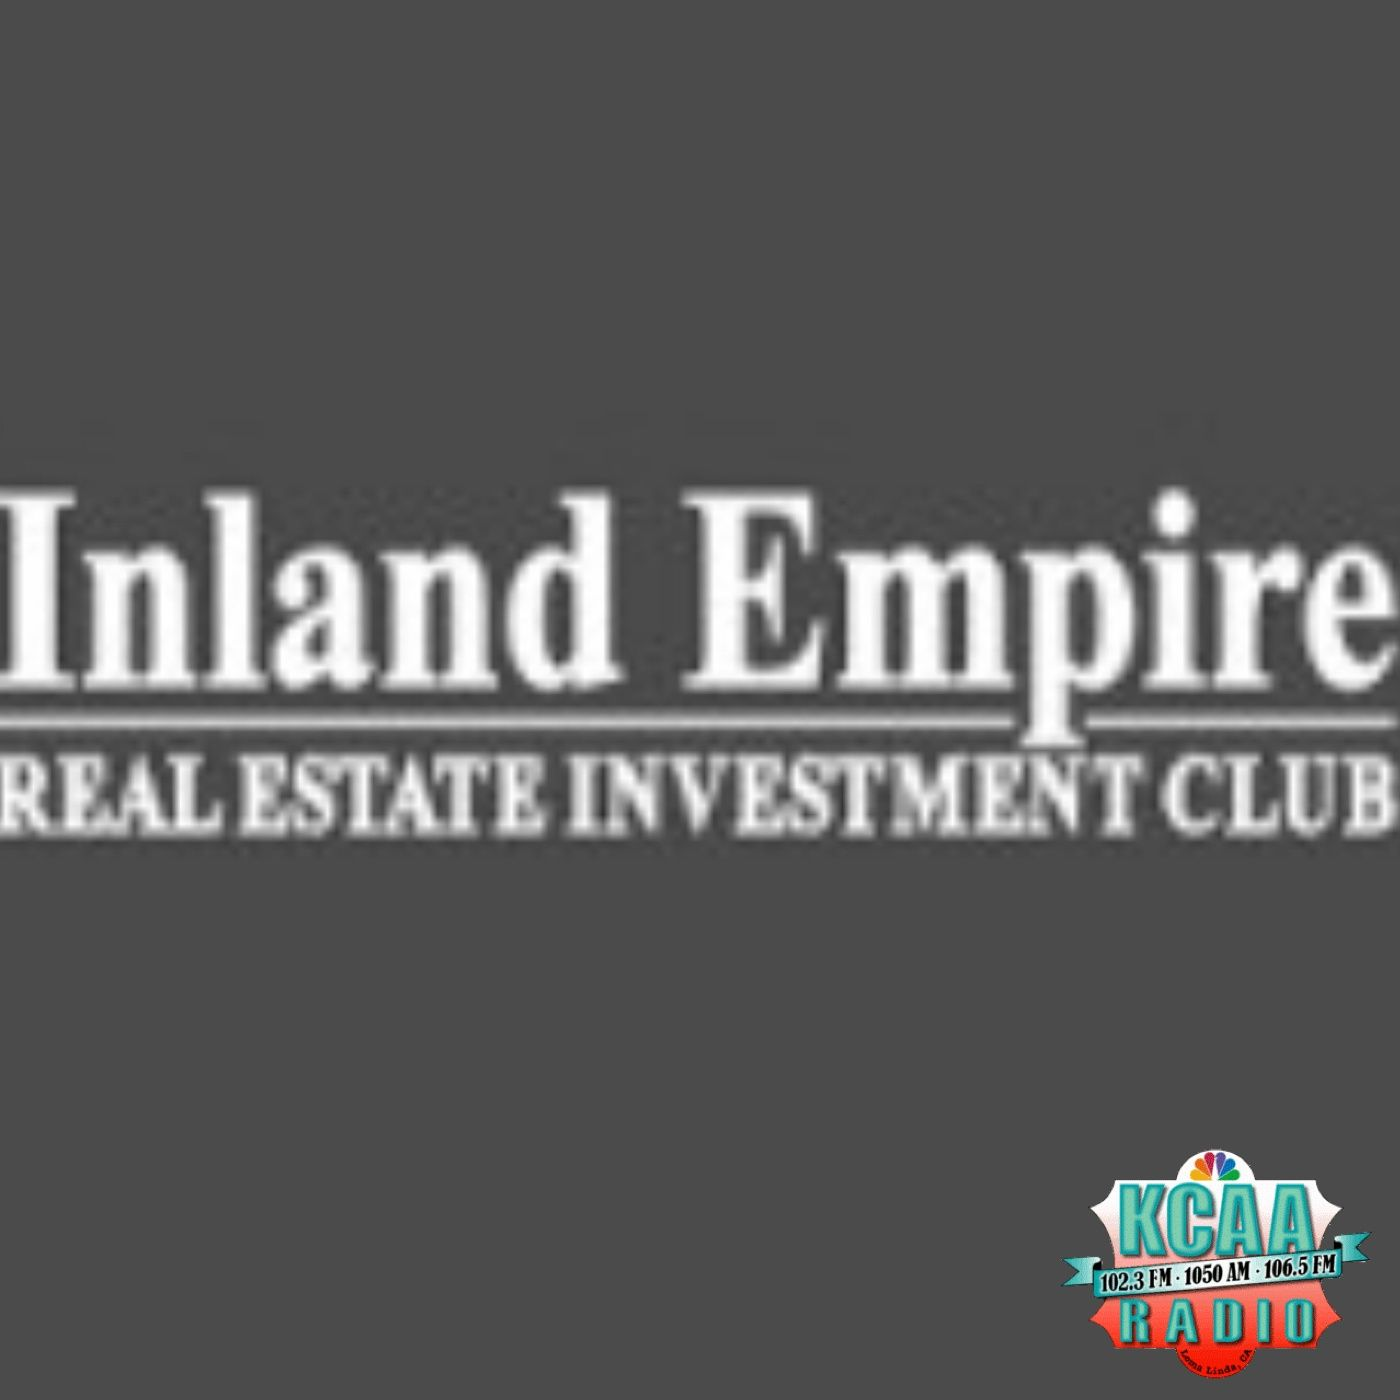 KCAA: Flip Flop Investor Radio Show (Thu, 7 Jan, 2021)